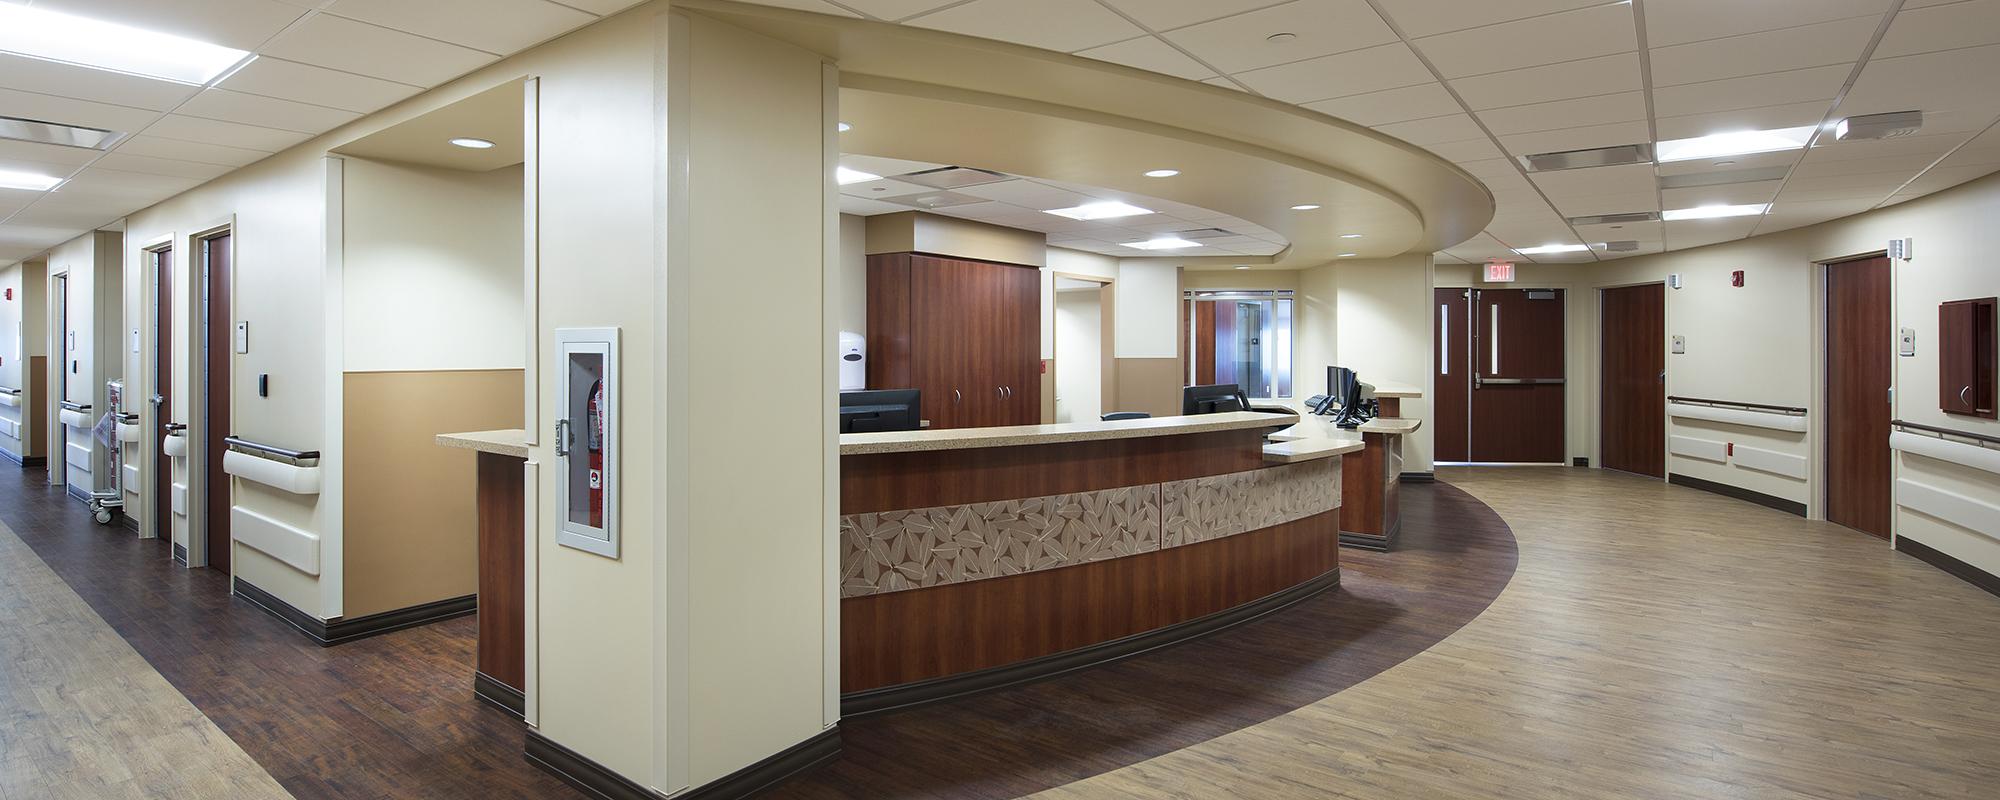 Nurses Station at AdventHealth Carrollwood